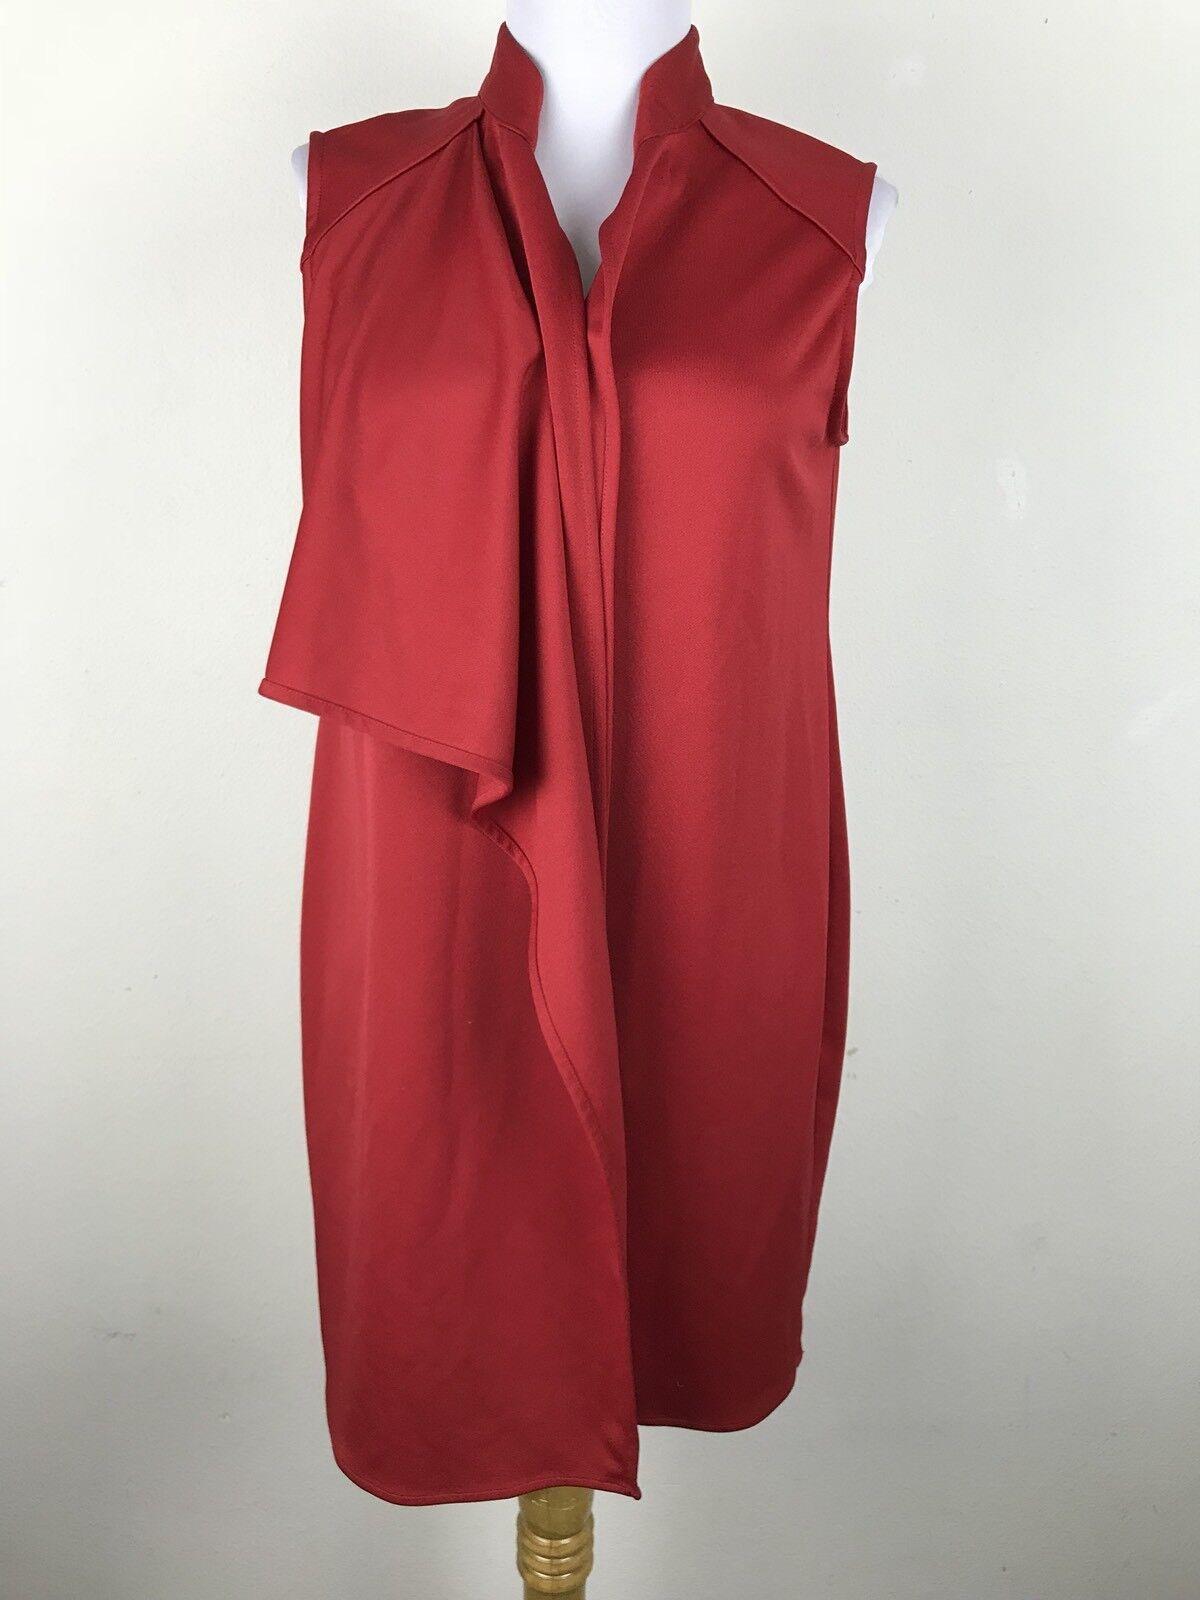 MOSSEE Australia Dress Size 8 Red Shift Sleeveless Career Work Womens Draped